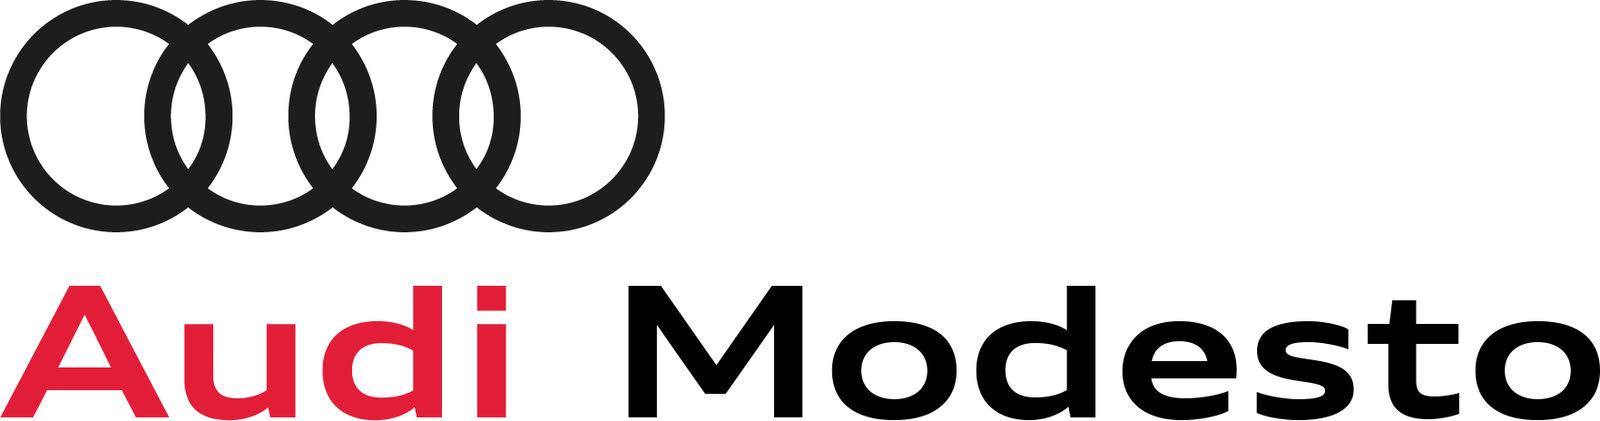 Audi Modesto